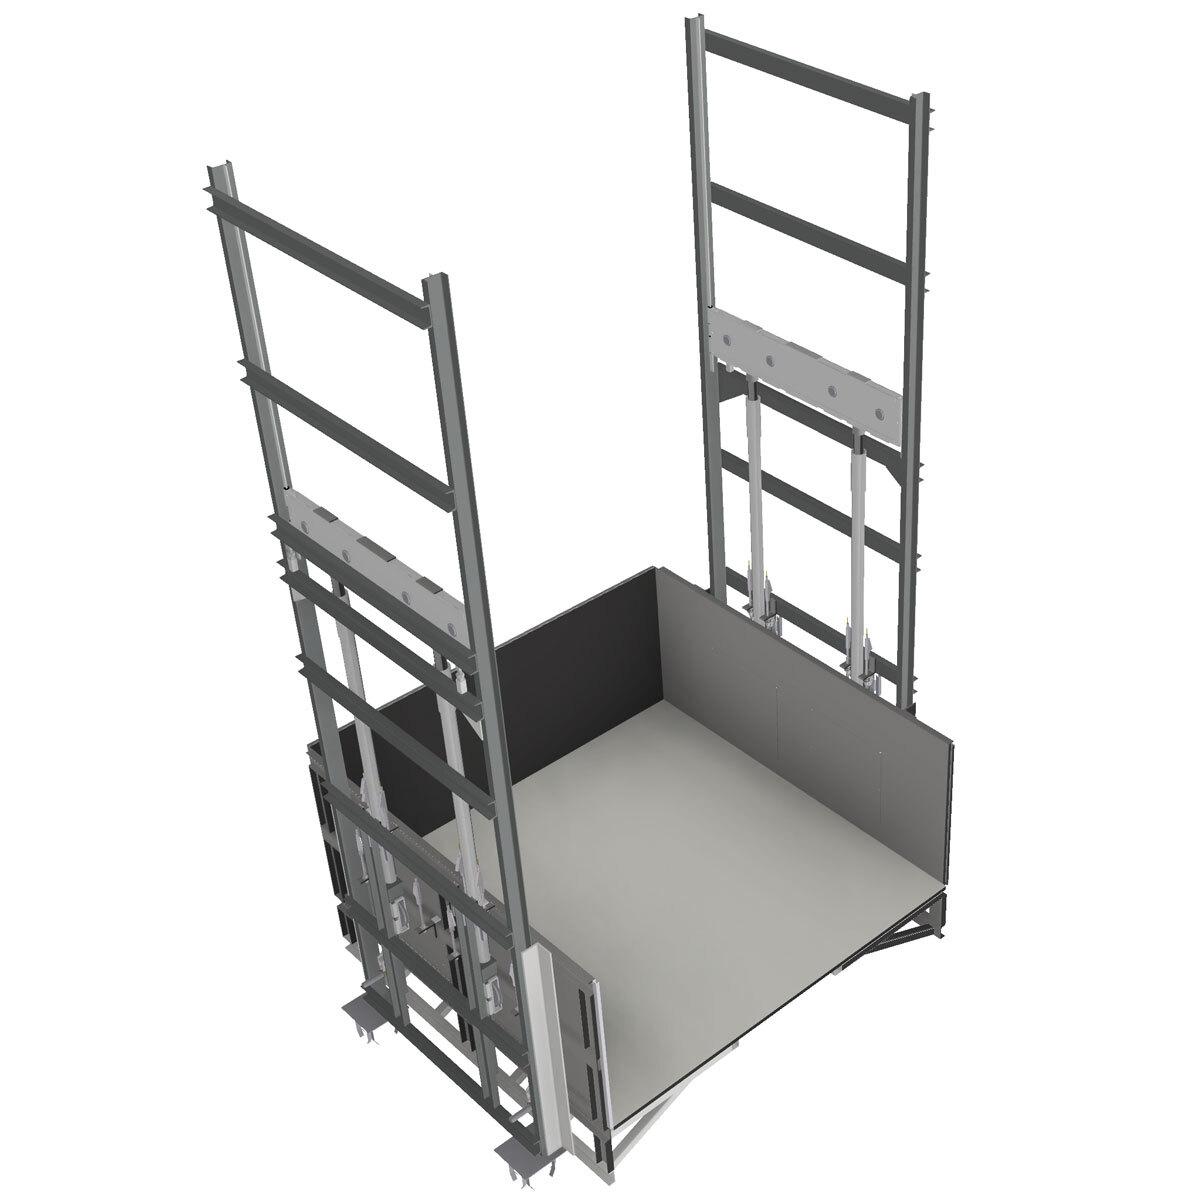 Plataforma PLT doble bastidor